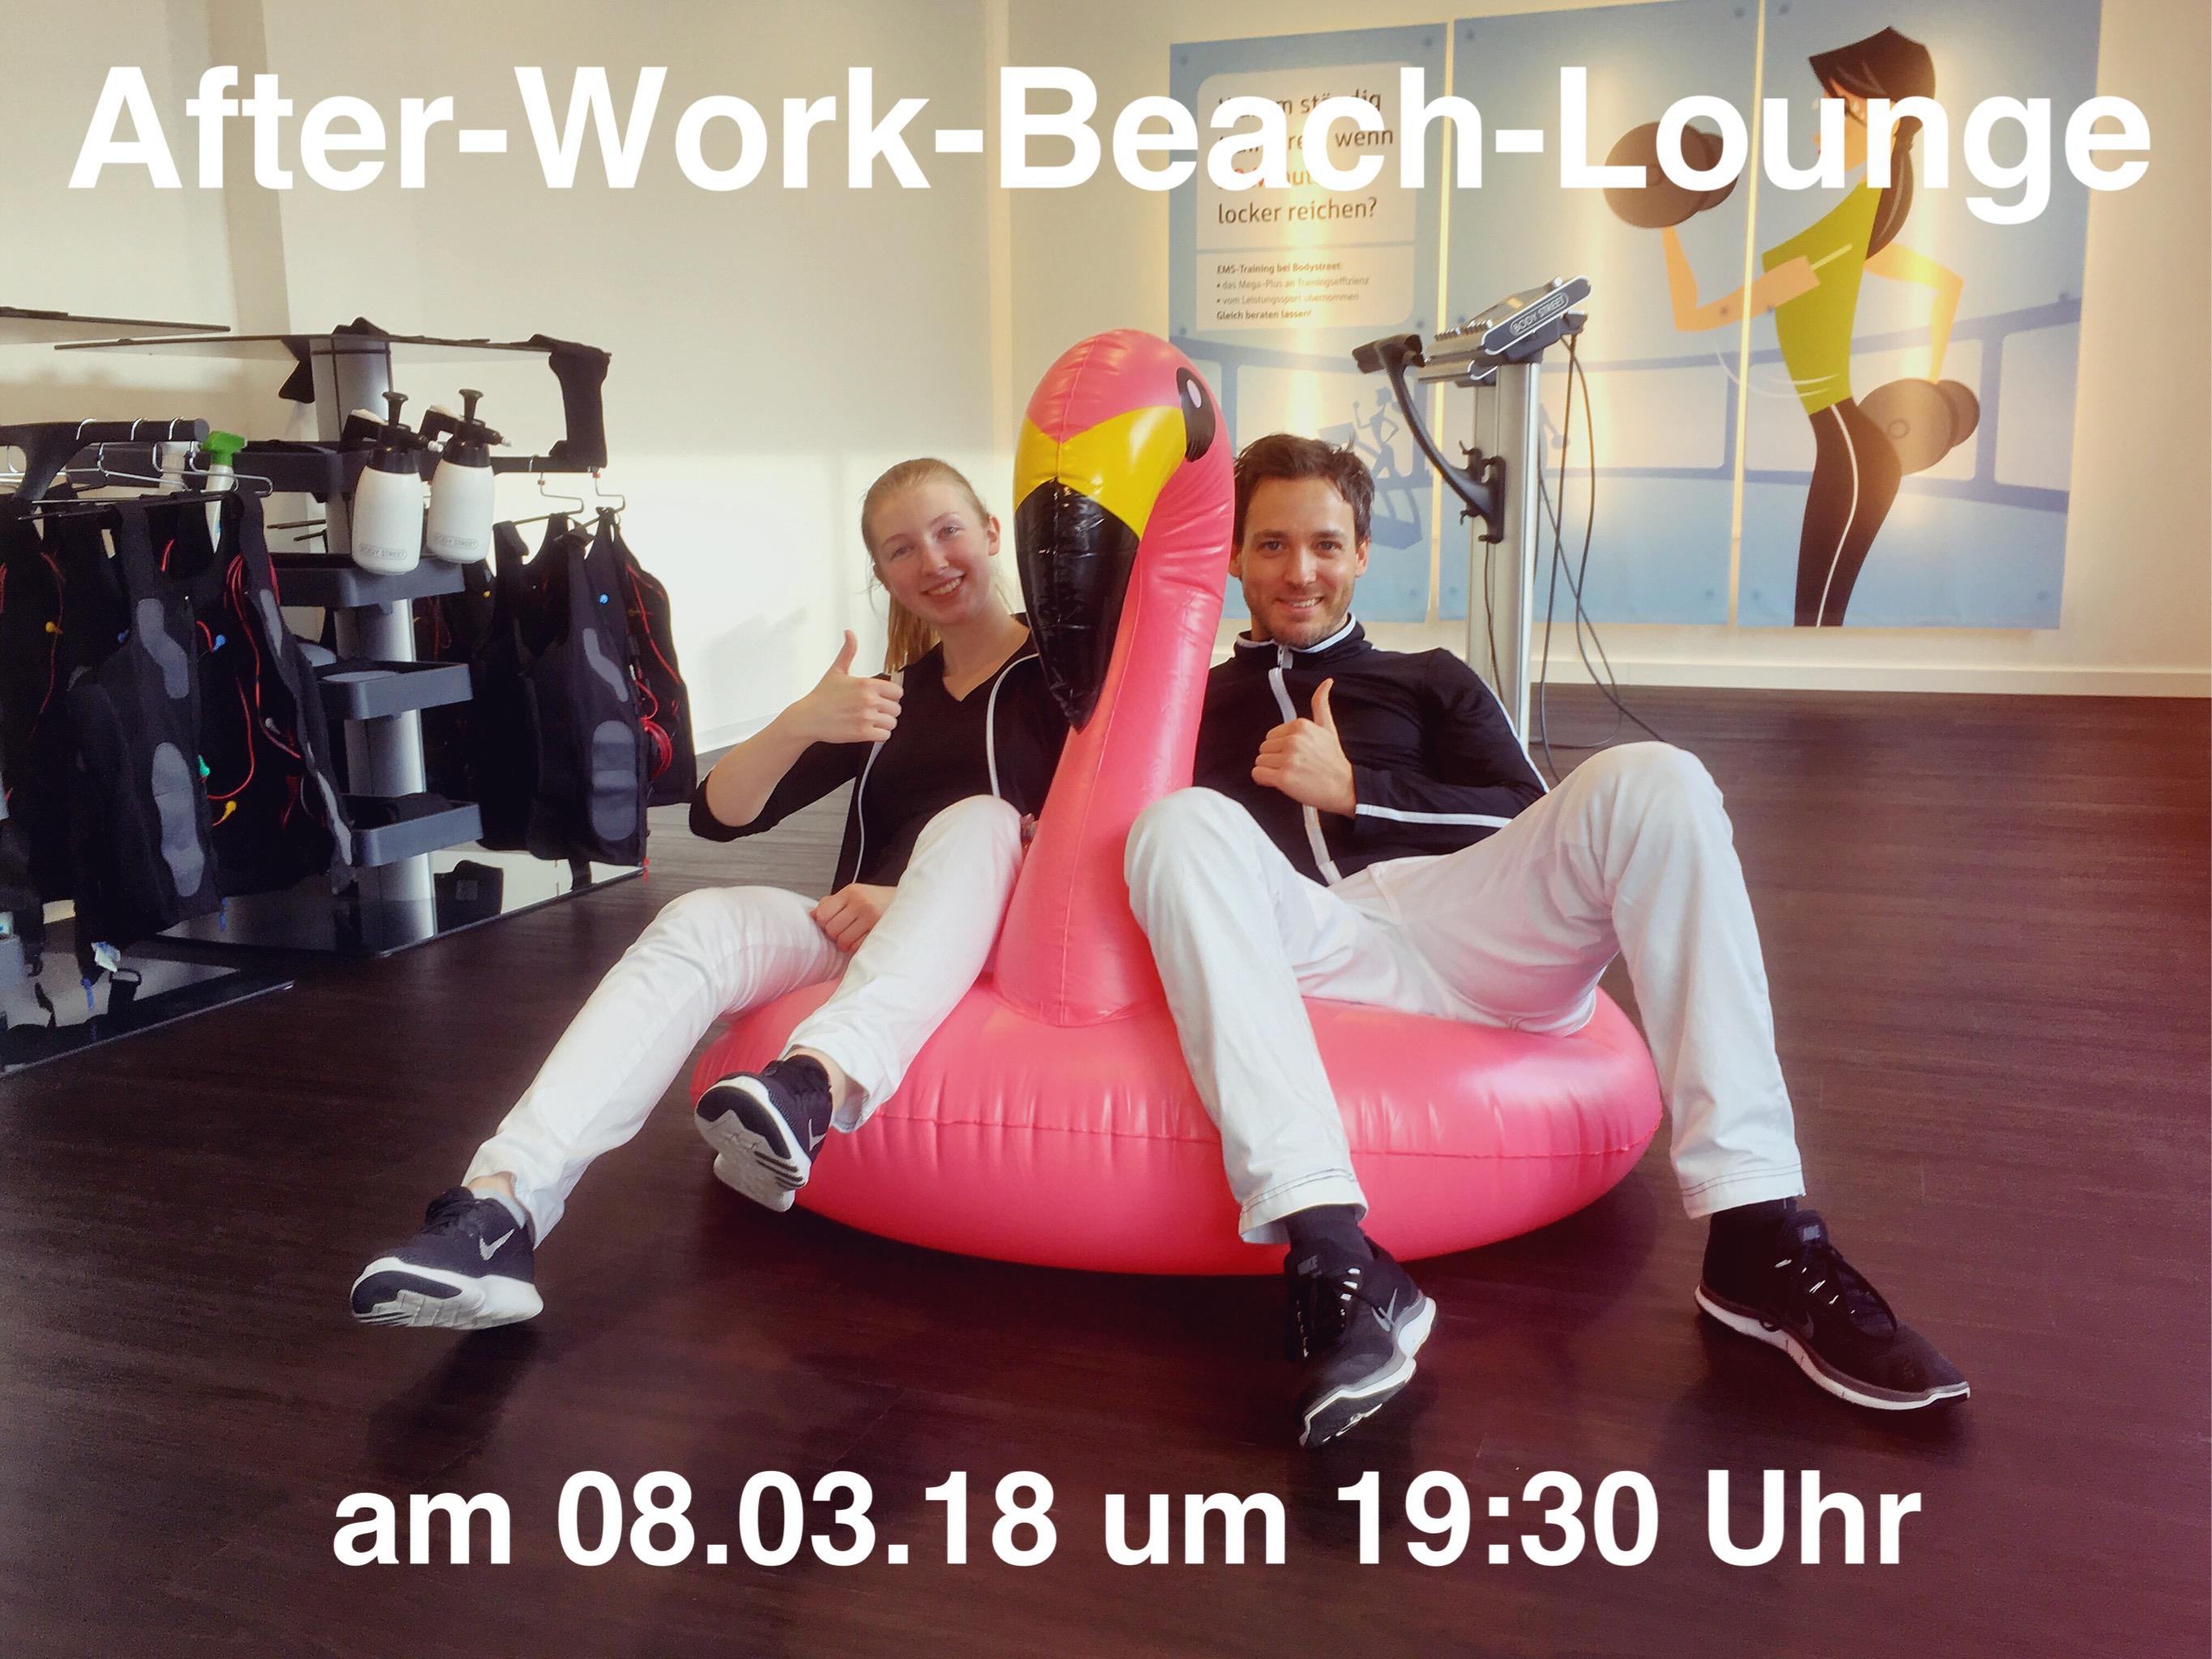 Bodystreet Großburgwedel lädt zur ersten After-Work Lounge